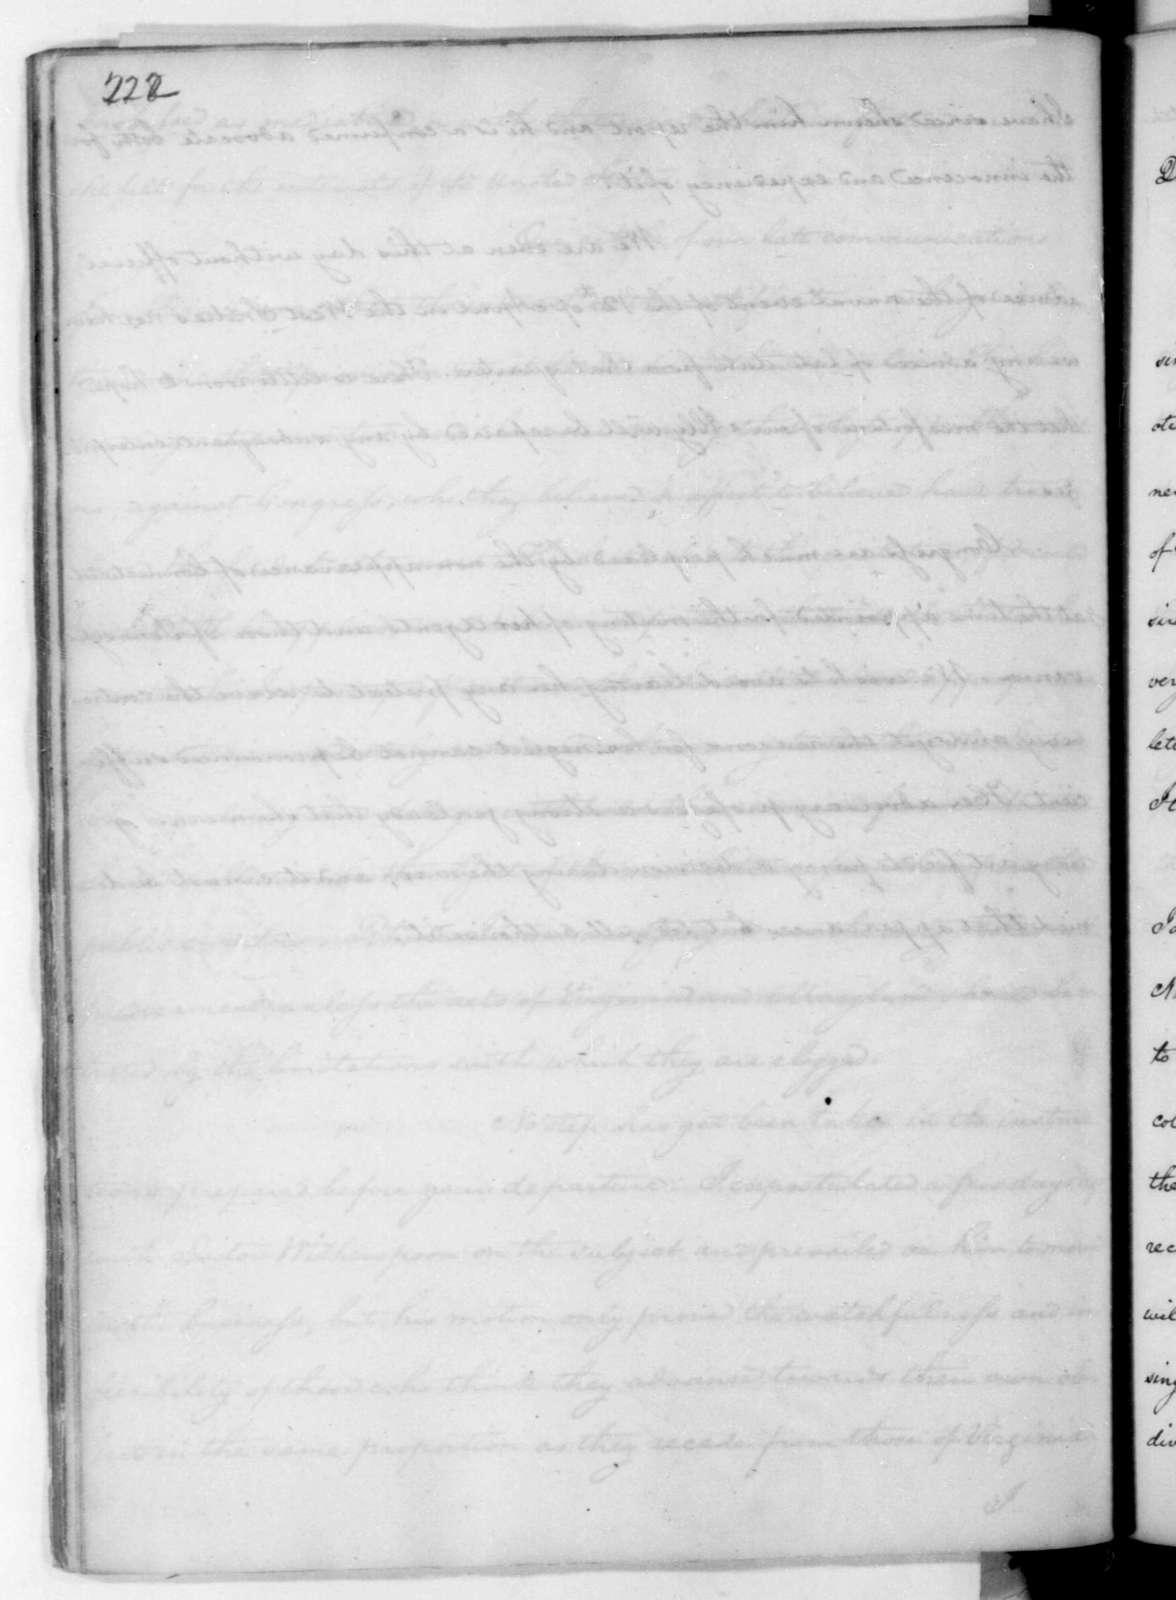 James Madison to Edmund Randolph, July 2, 1782.